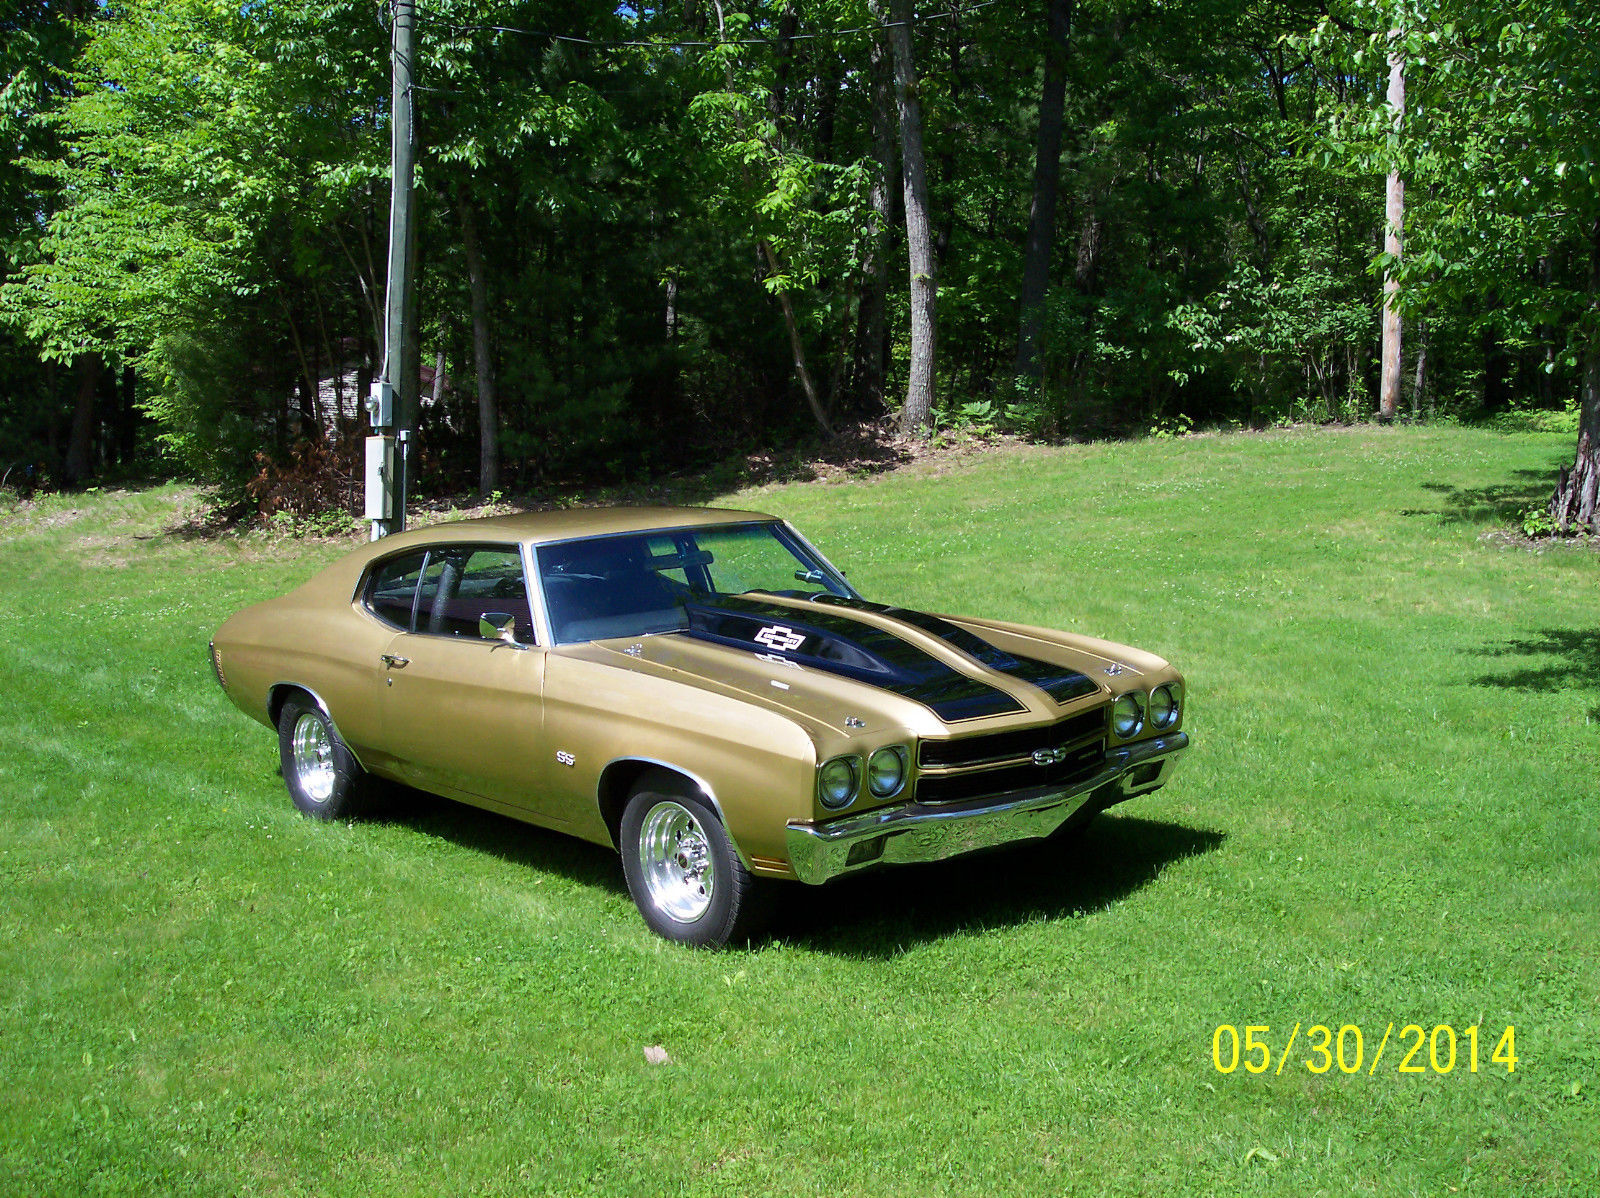 1970 Chevrolet Chevelle2